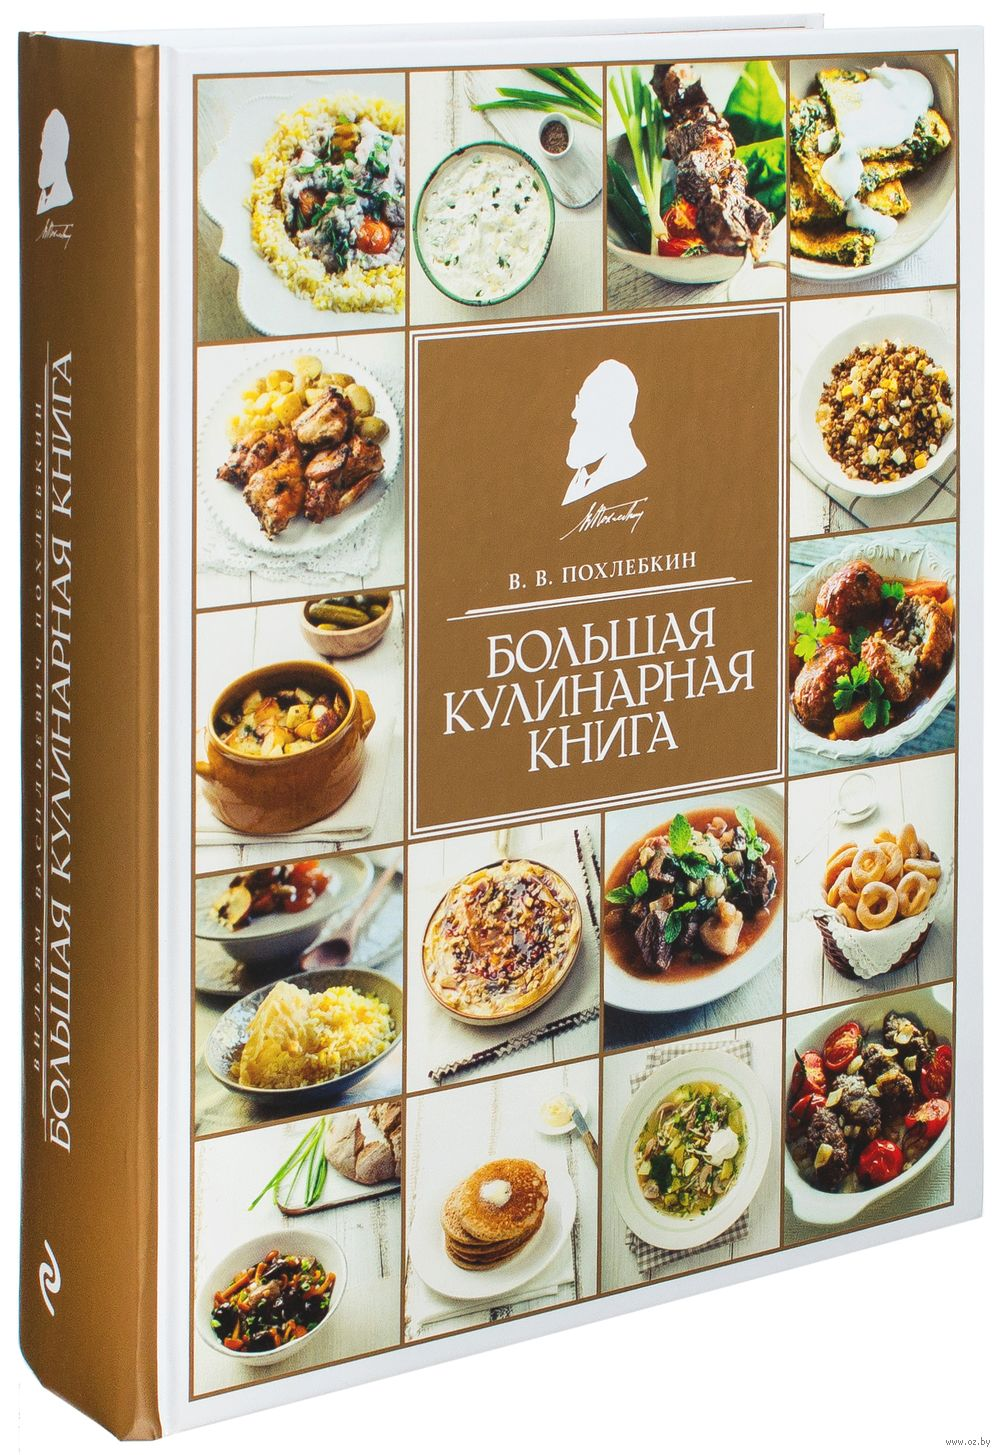 дореволюционная книга по кулинарии